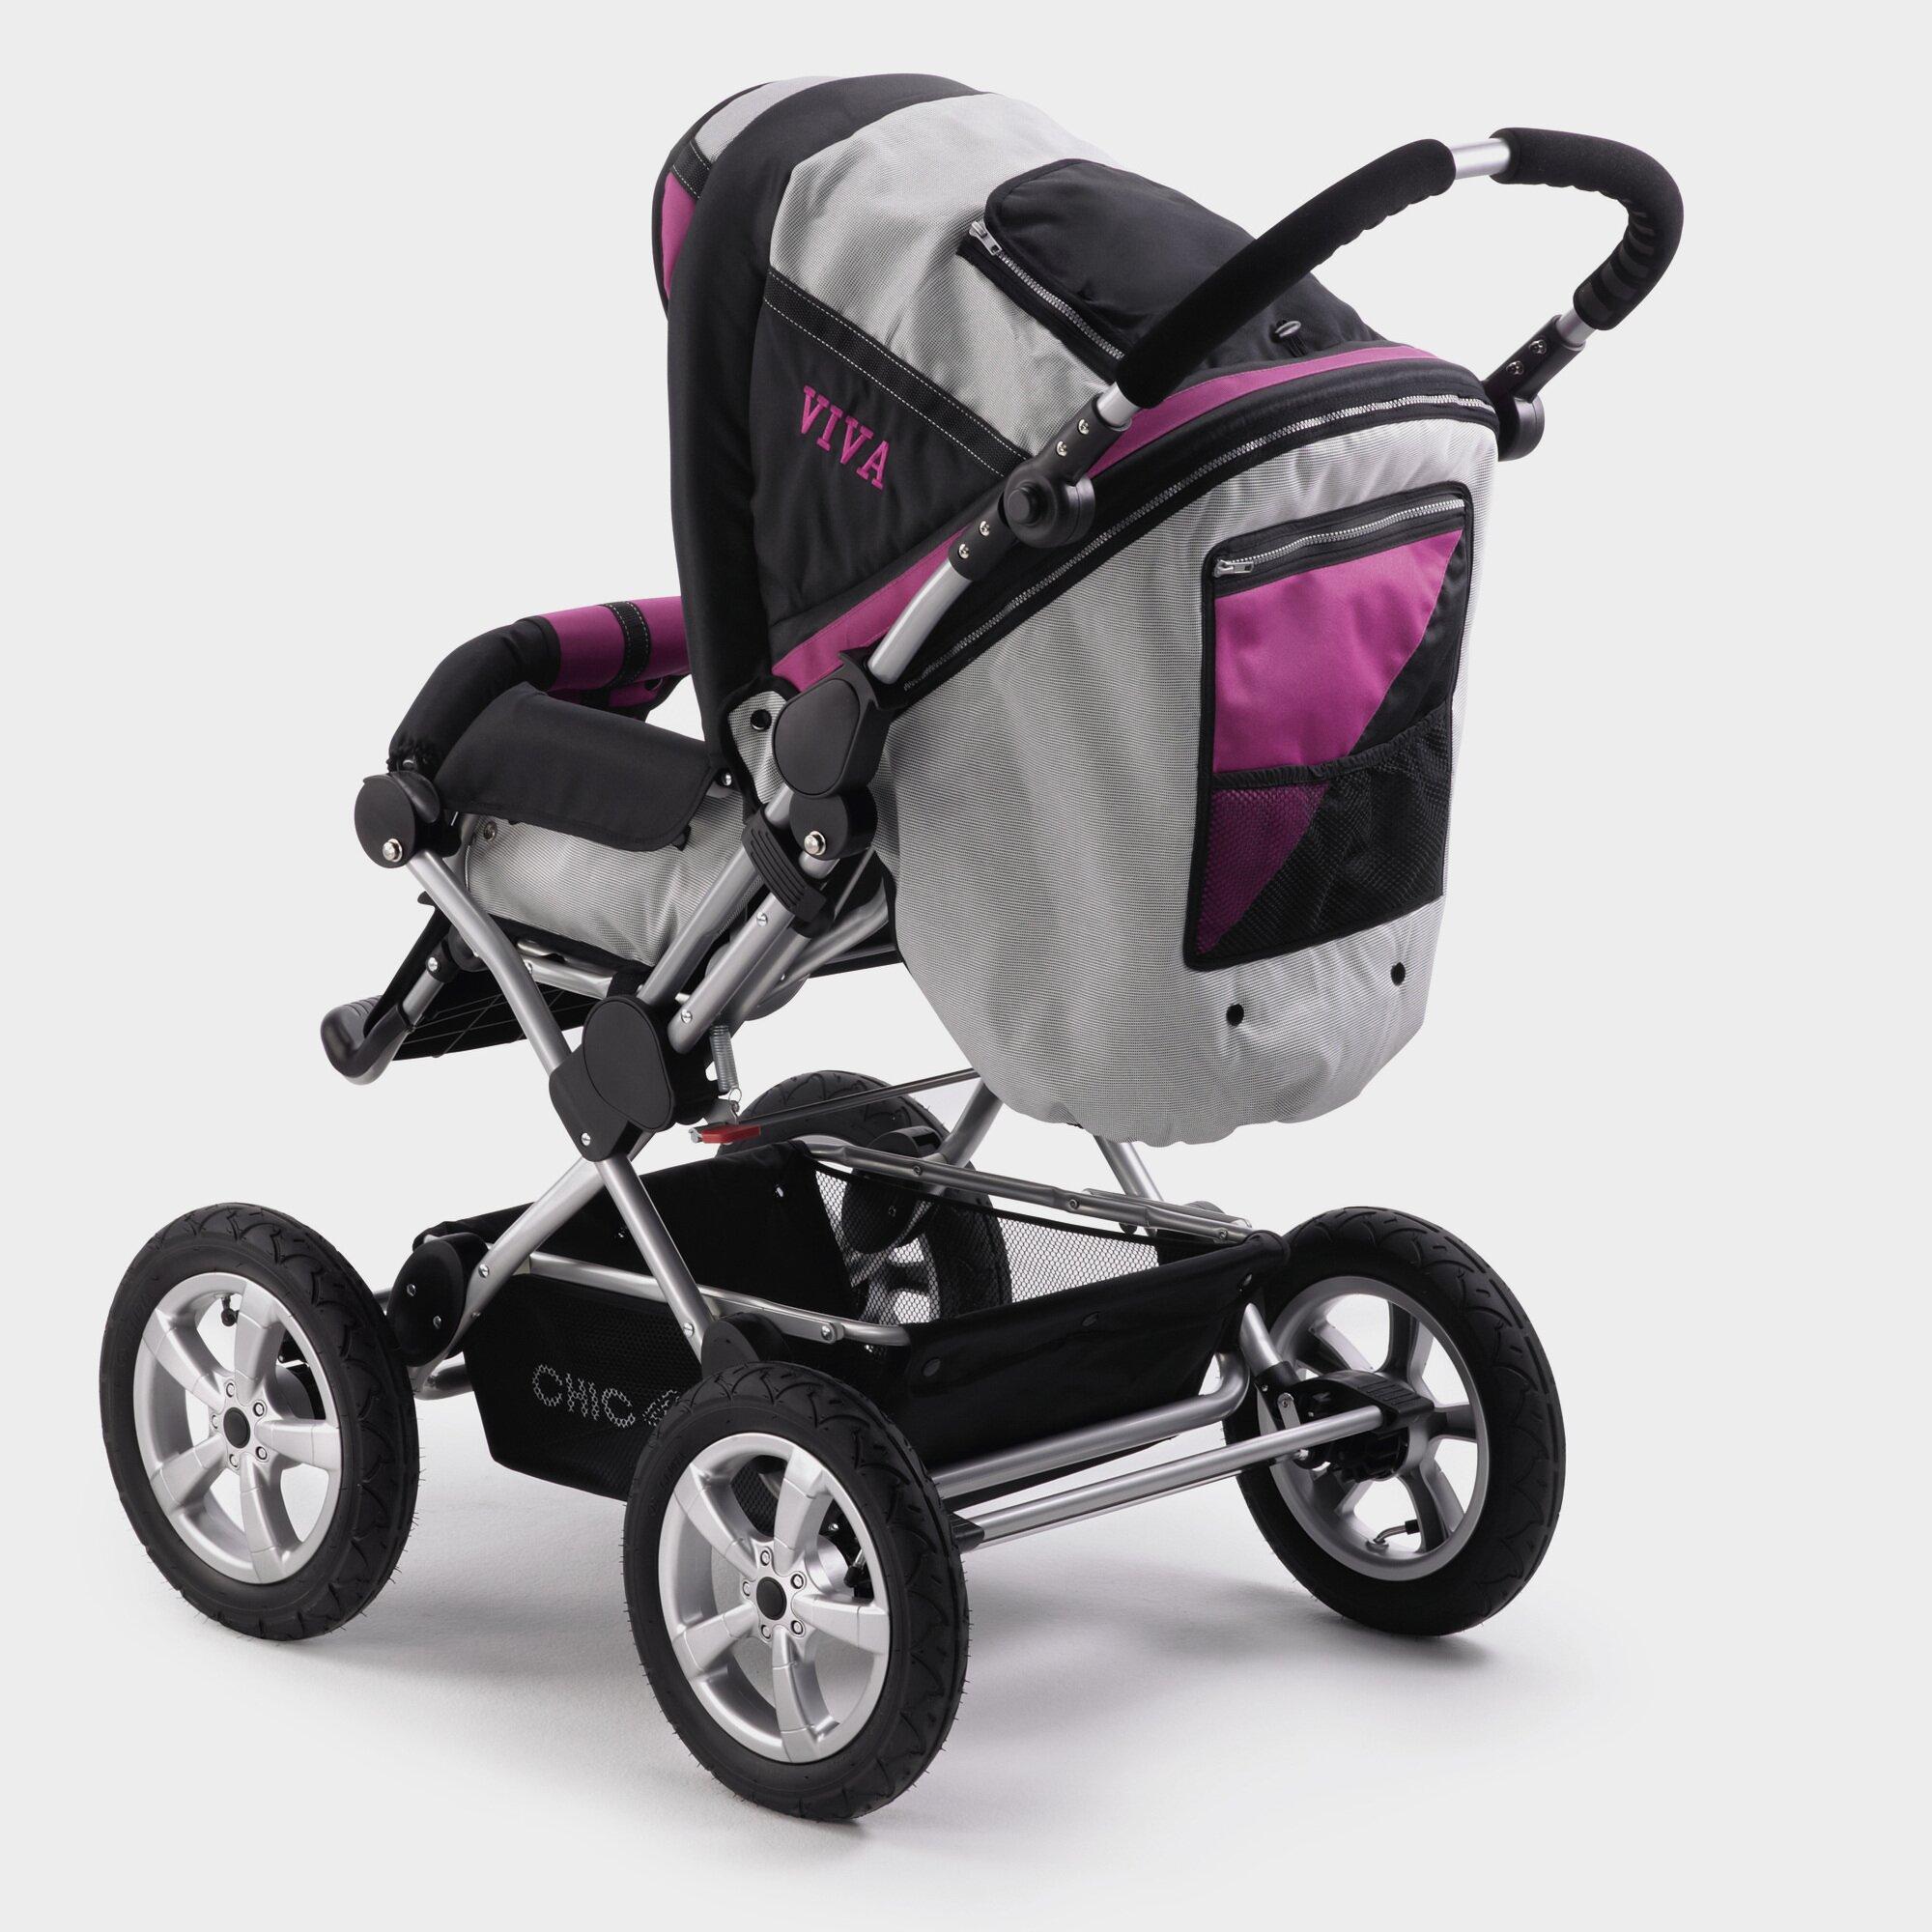 chic-4-baby-viva-kombikinderwagen-schwarz